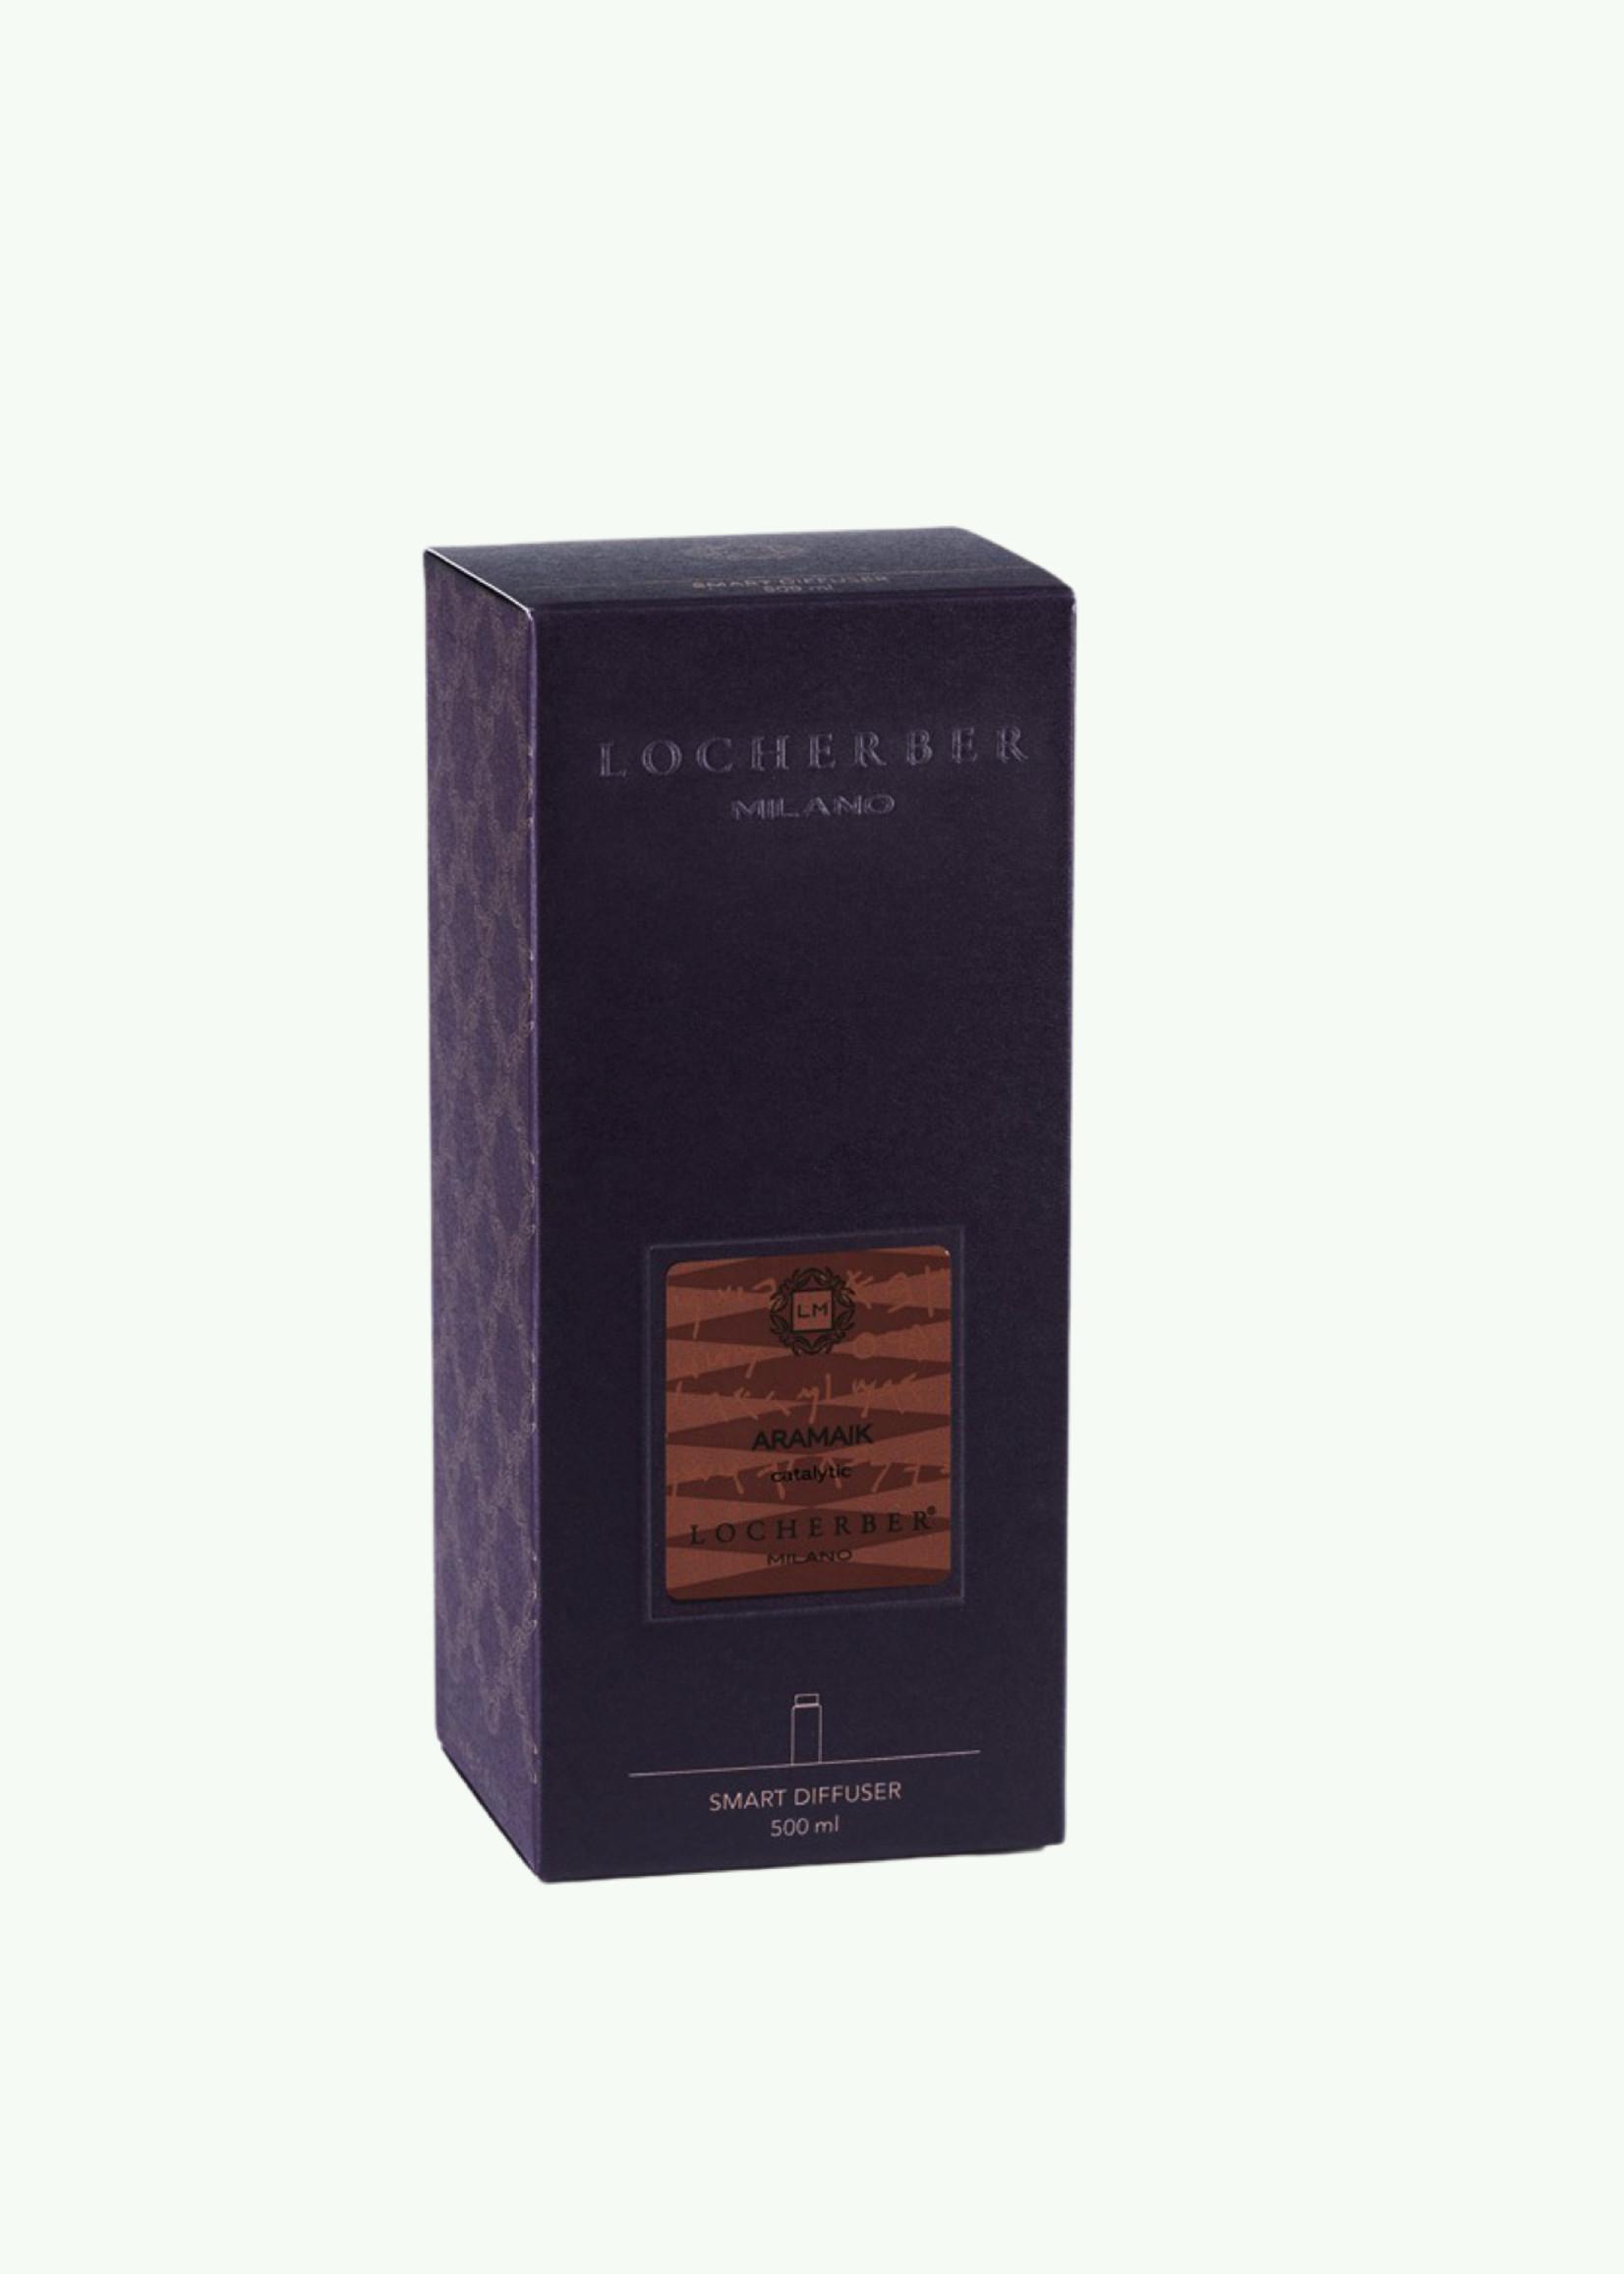 Locherber Locherber - Aramaik - Navulfles 500 ml